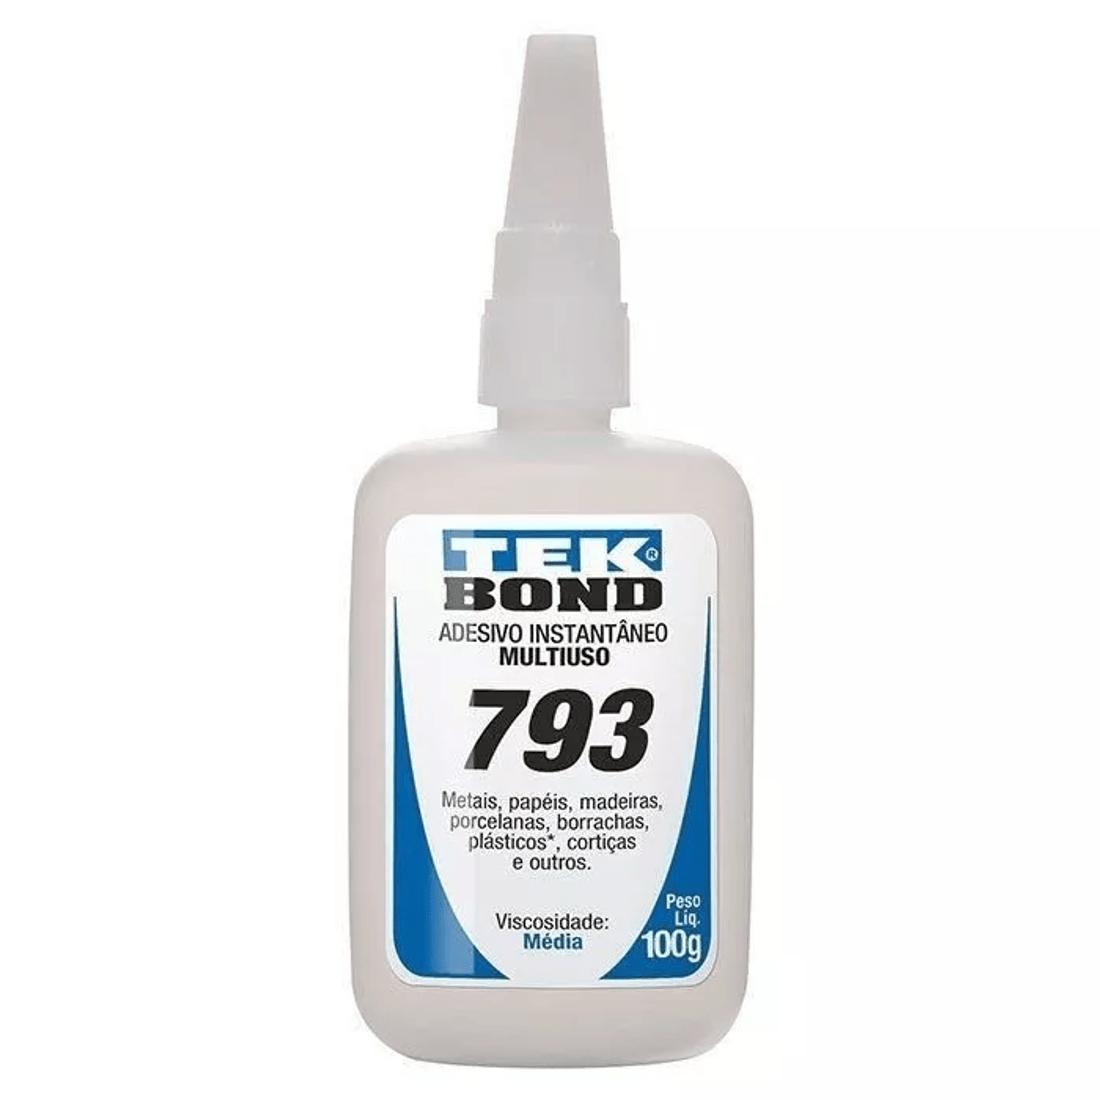 15537_1692